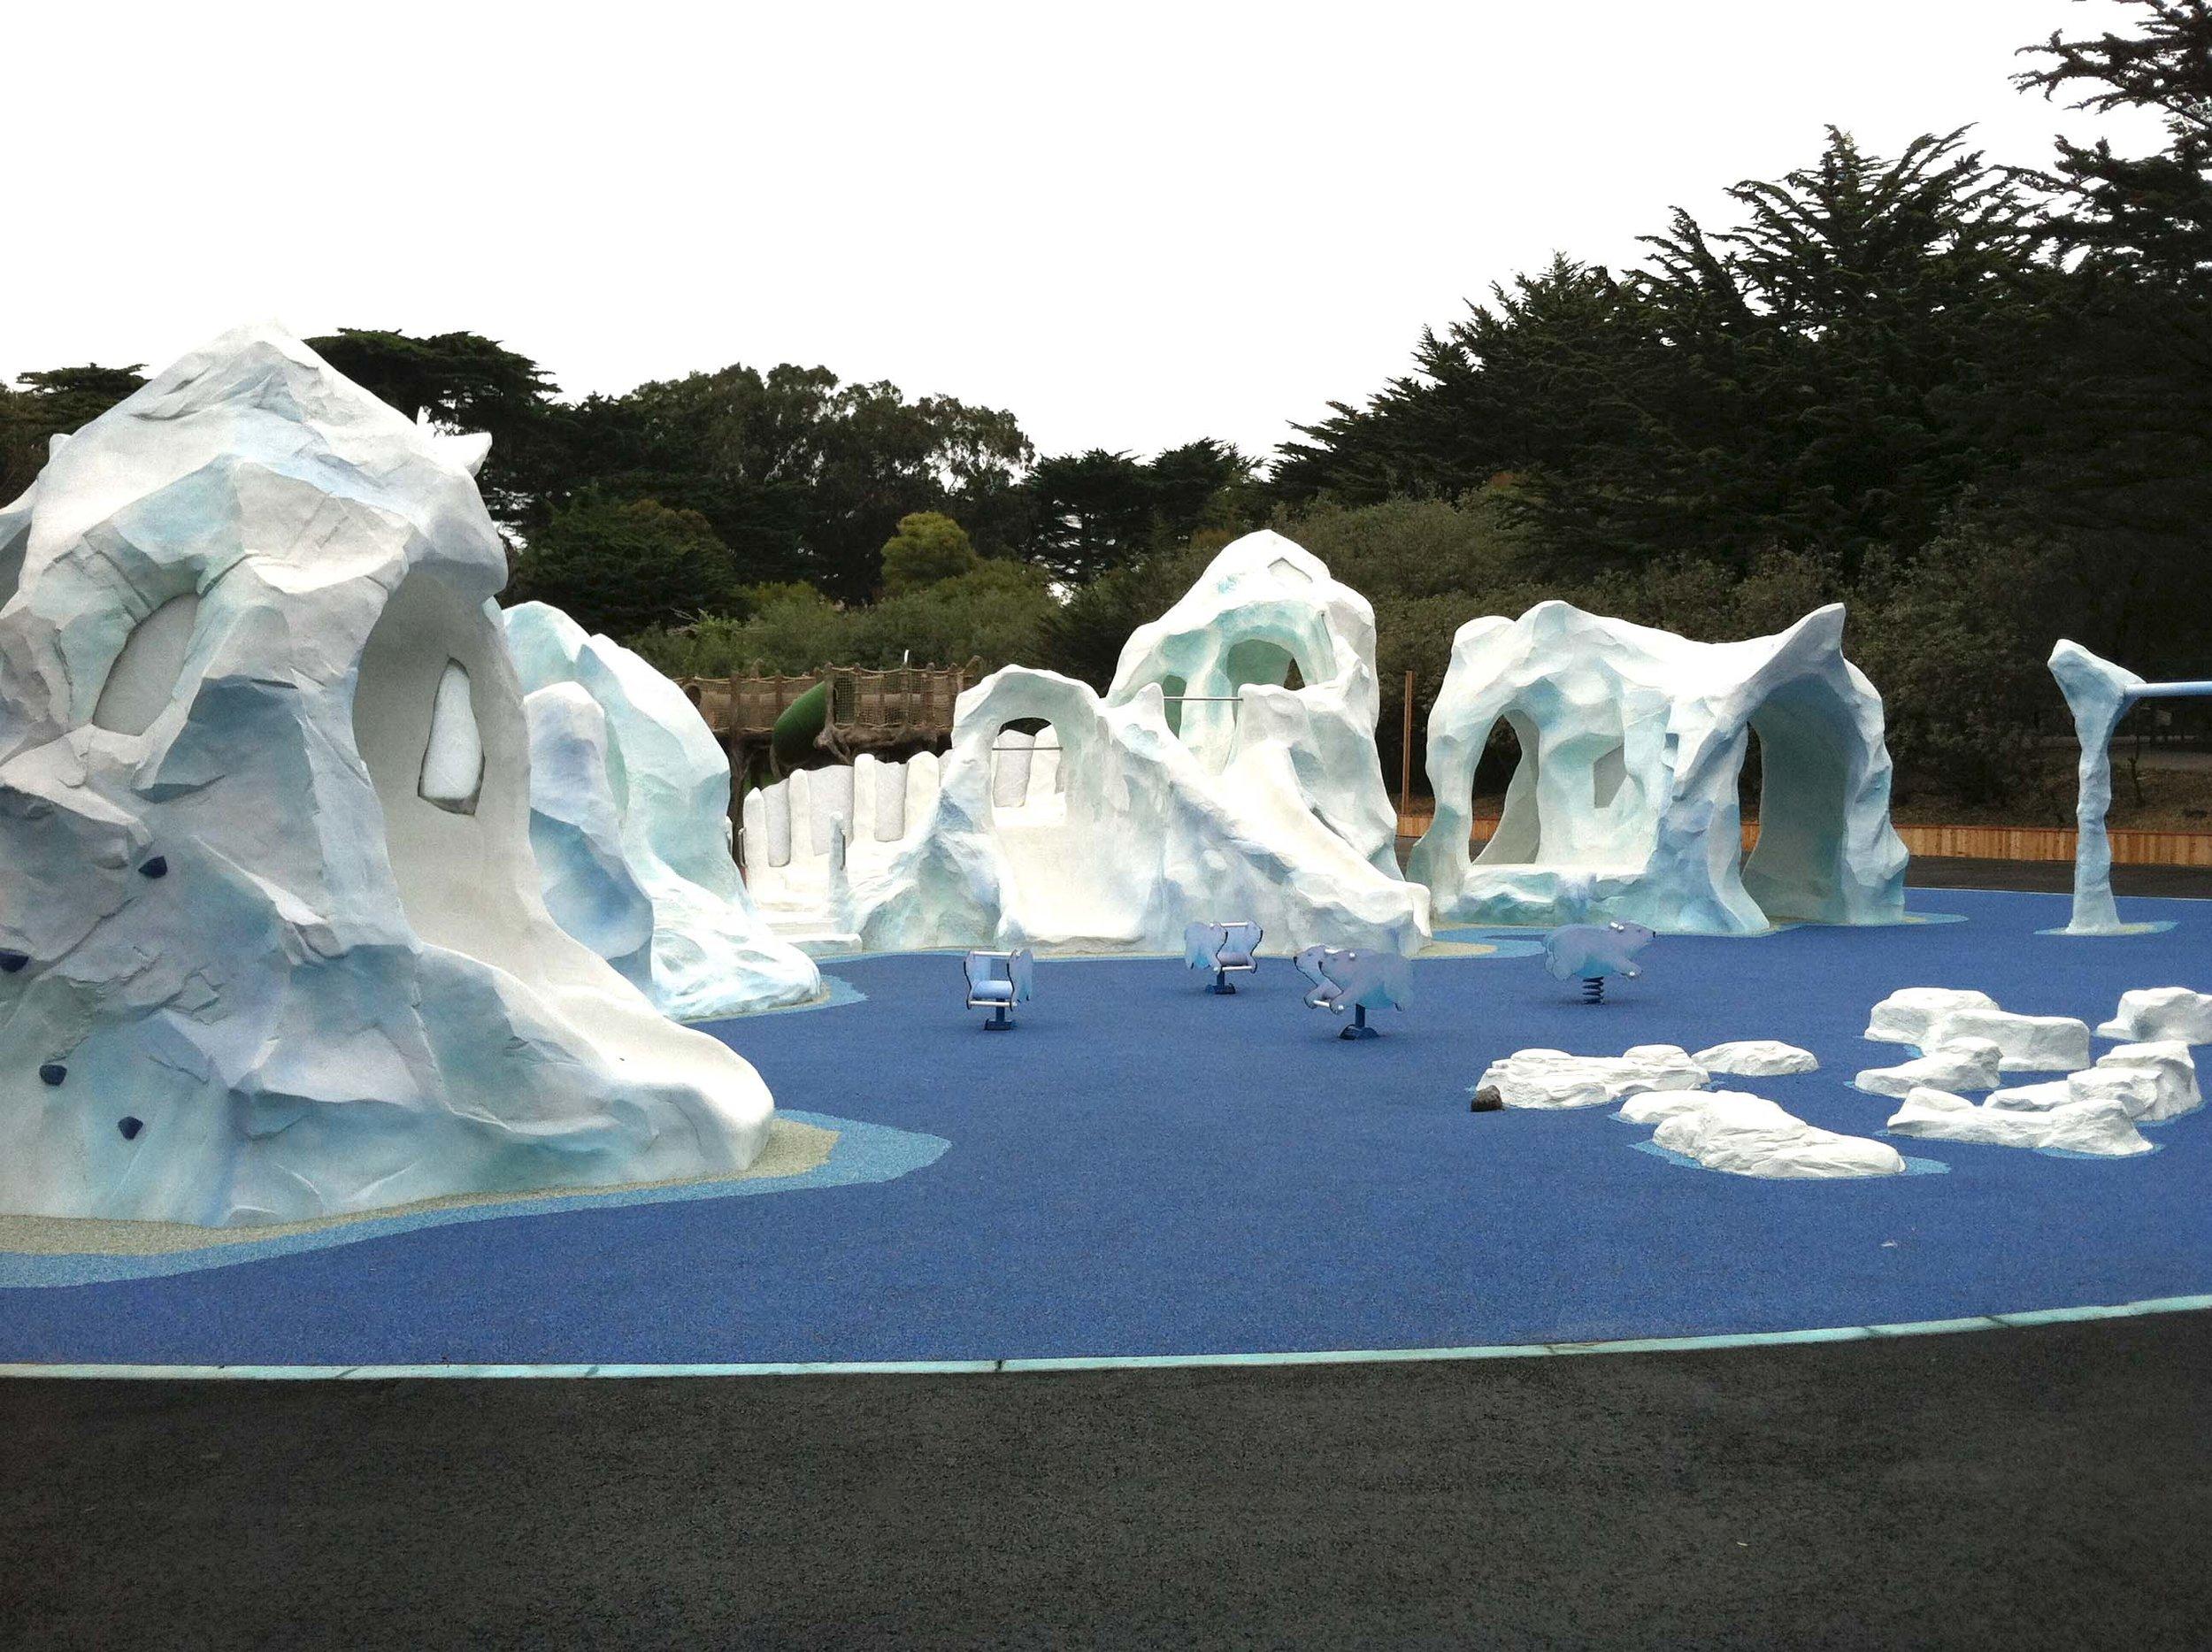 SF Zoo.Playground.Polar Zone.Iceberg.IMG_5068.JPG